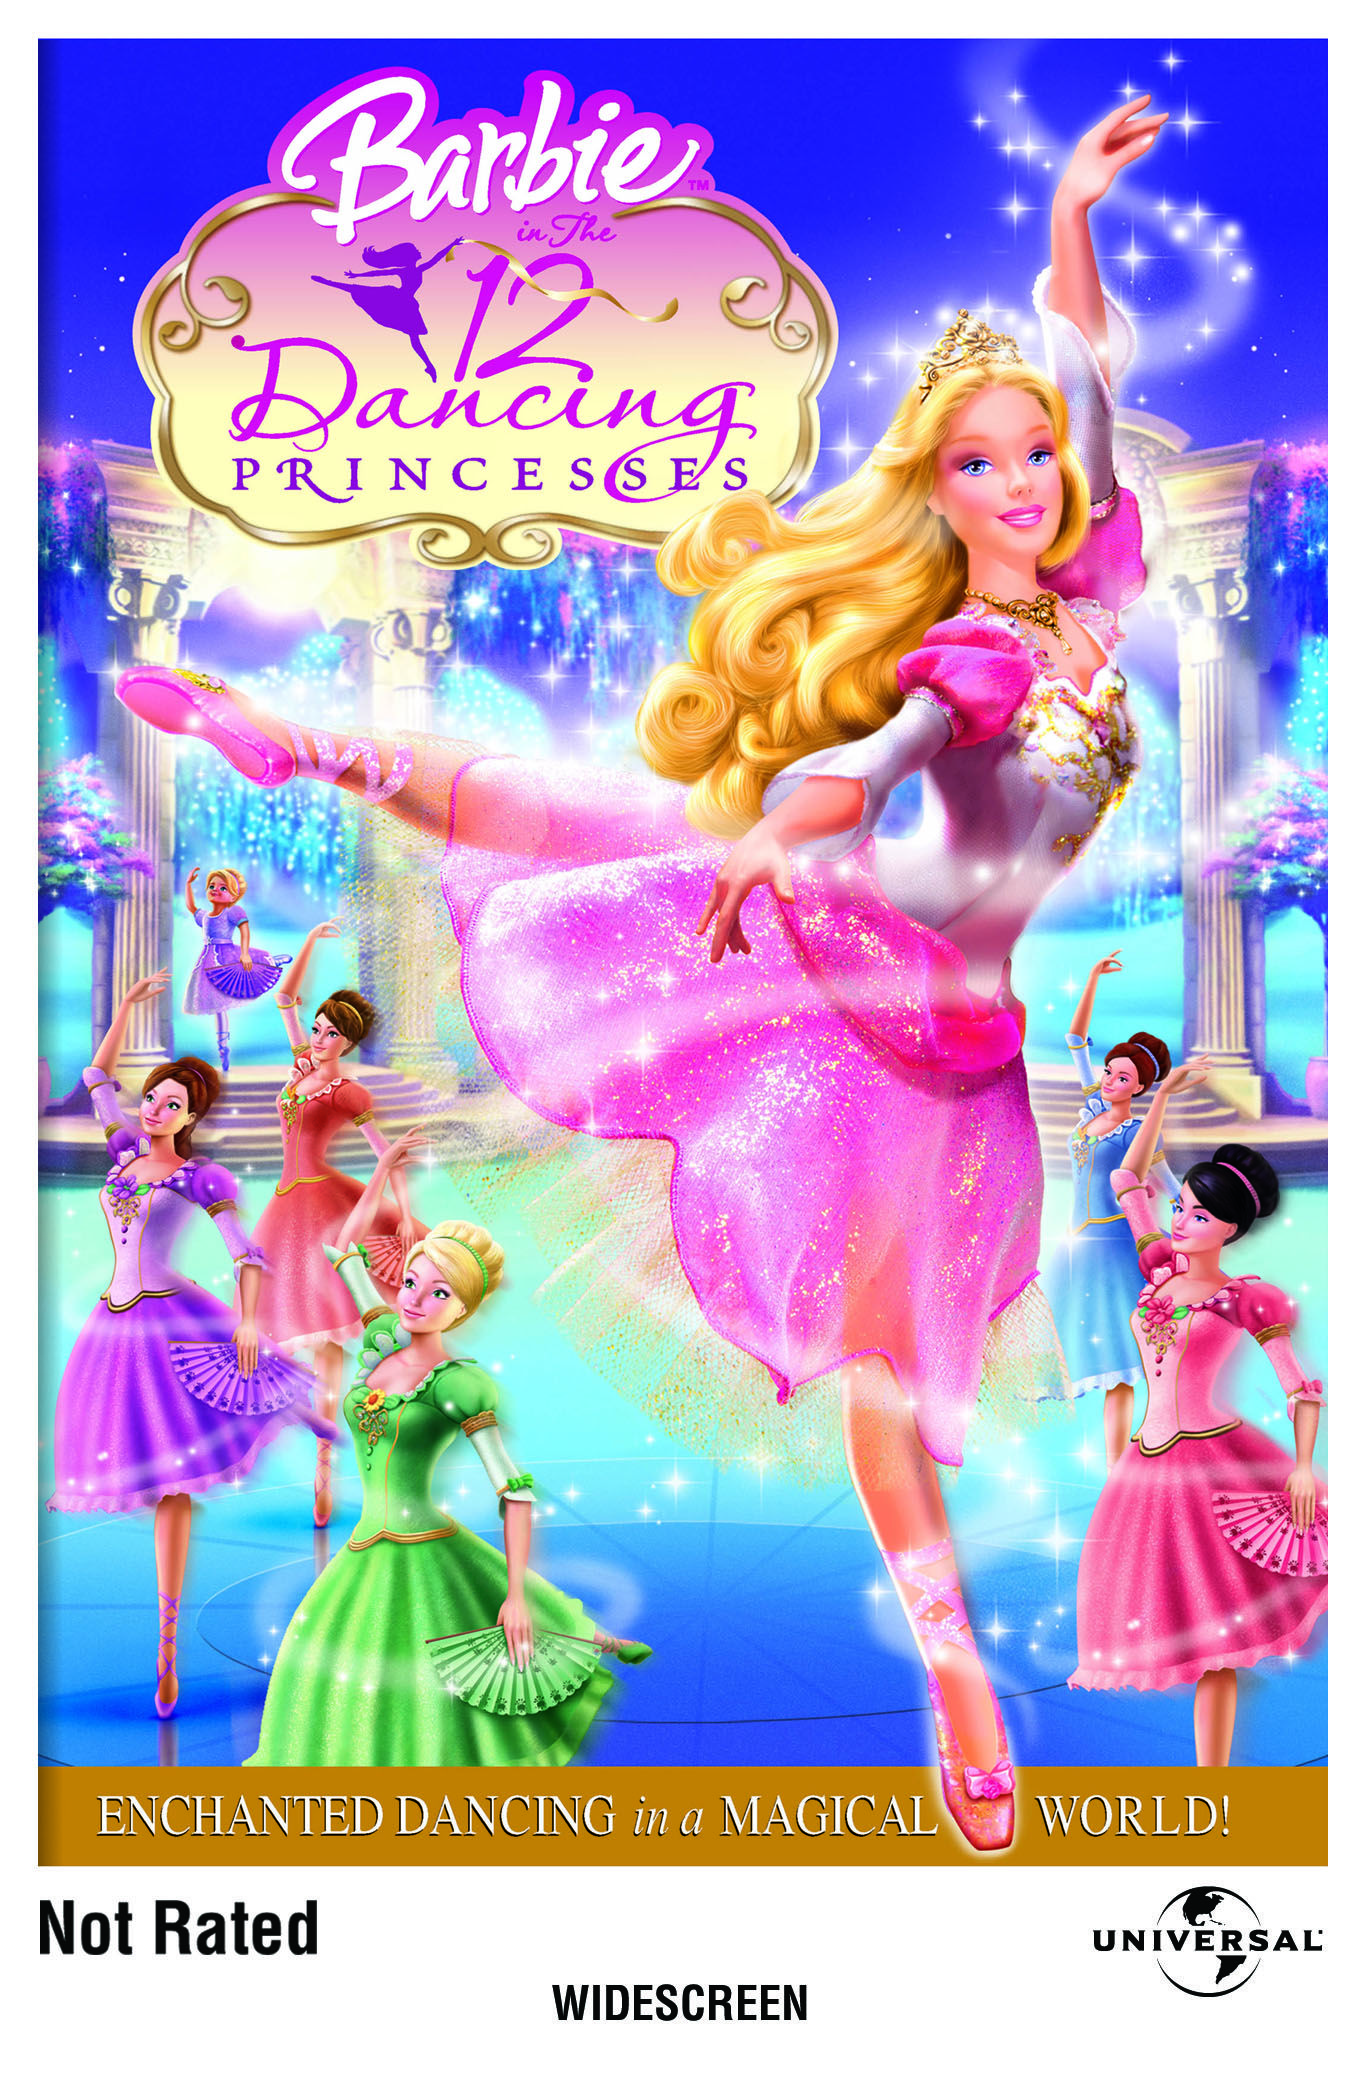 barbie in the 12 dancing princesses full movie dailymotion